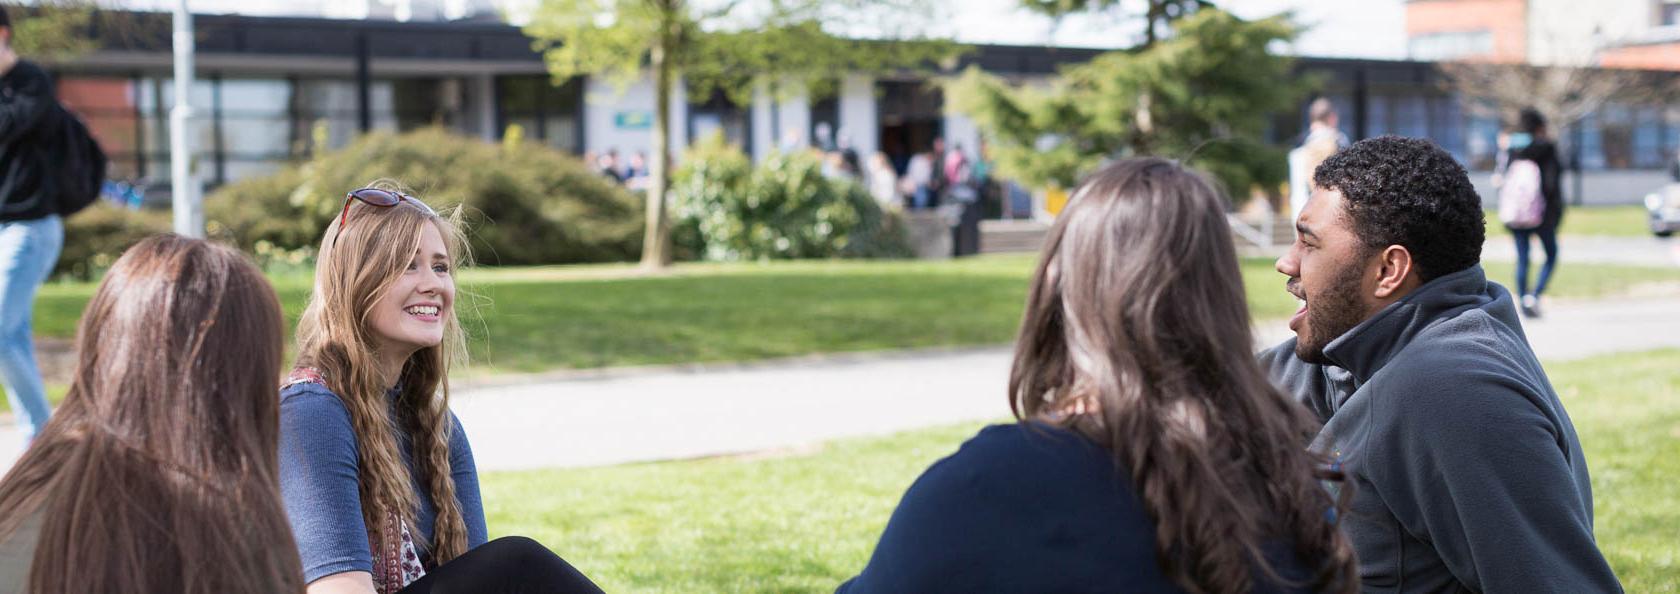 students - sunshine - North Campus